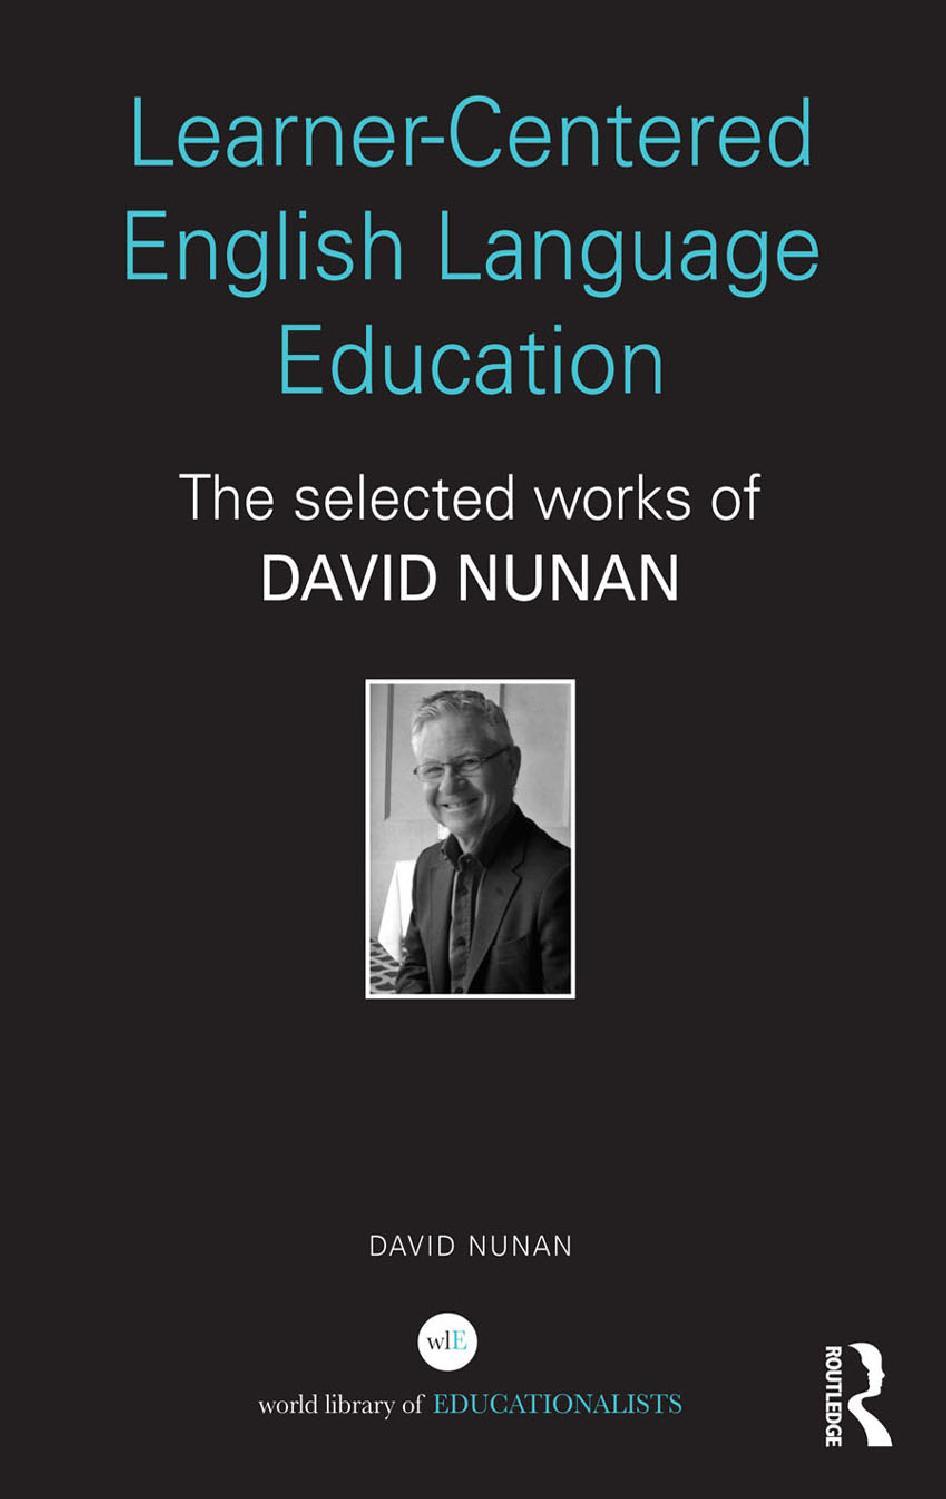 David nunan learner centered english language edbookzz org by david nunan learner centered english language edbookzz org by diego dueas issuu fandeluxe Image collections